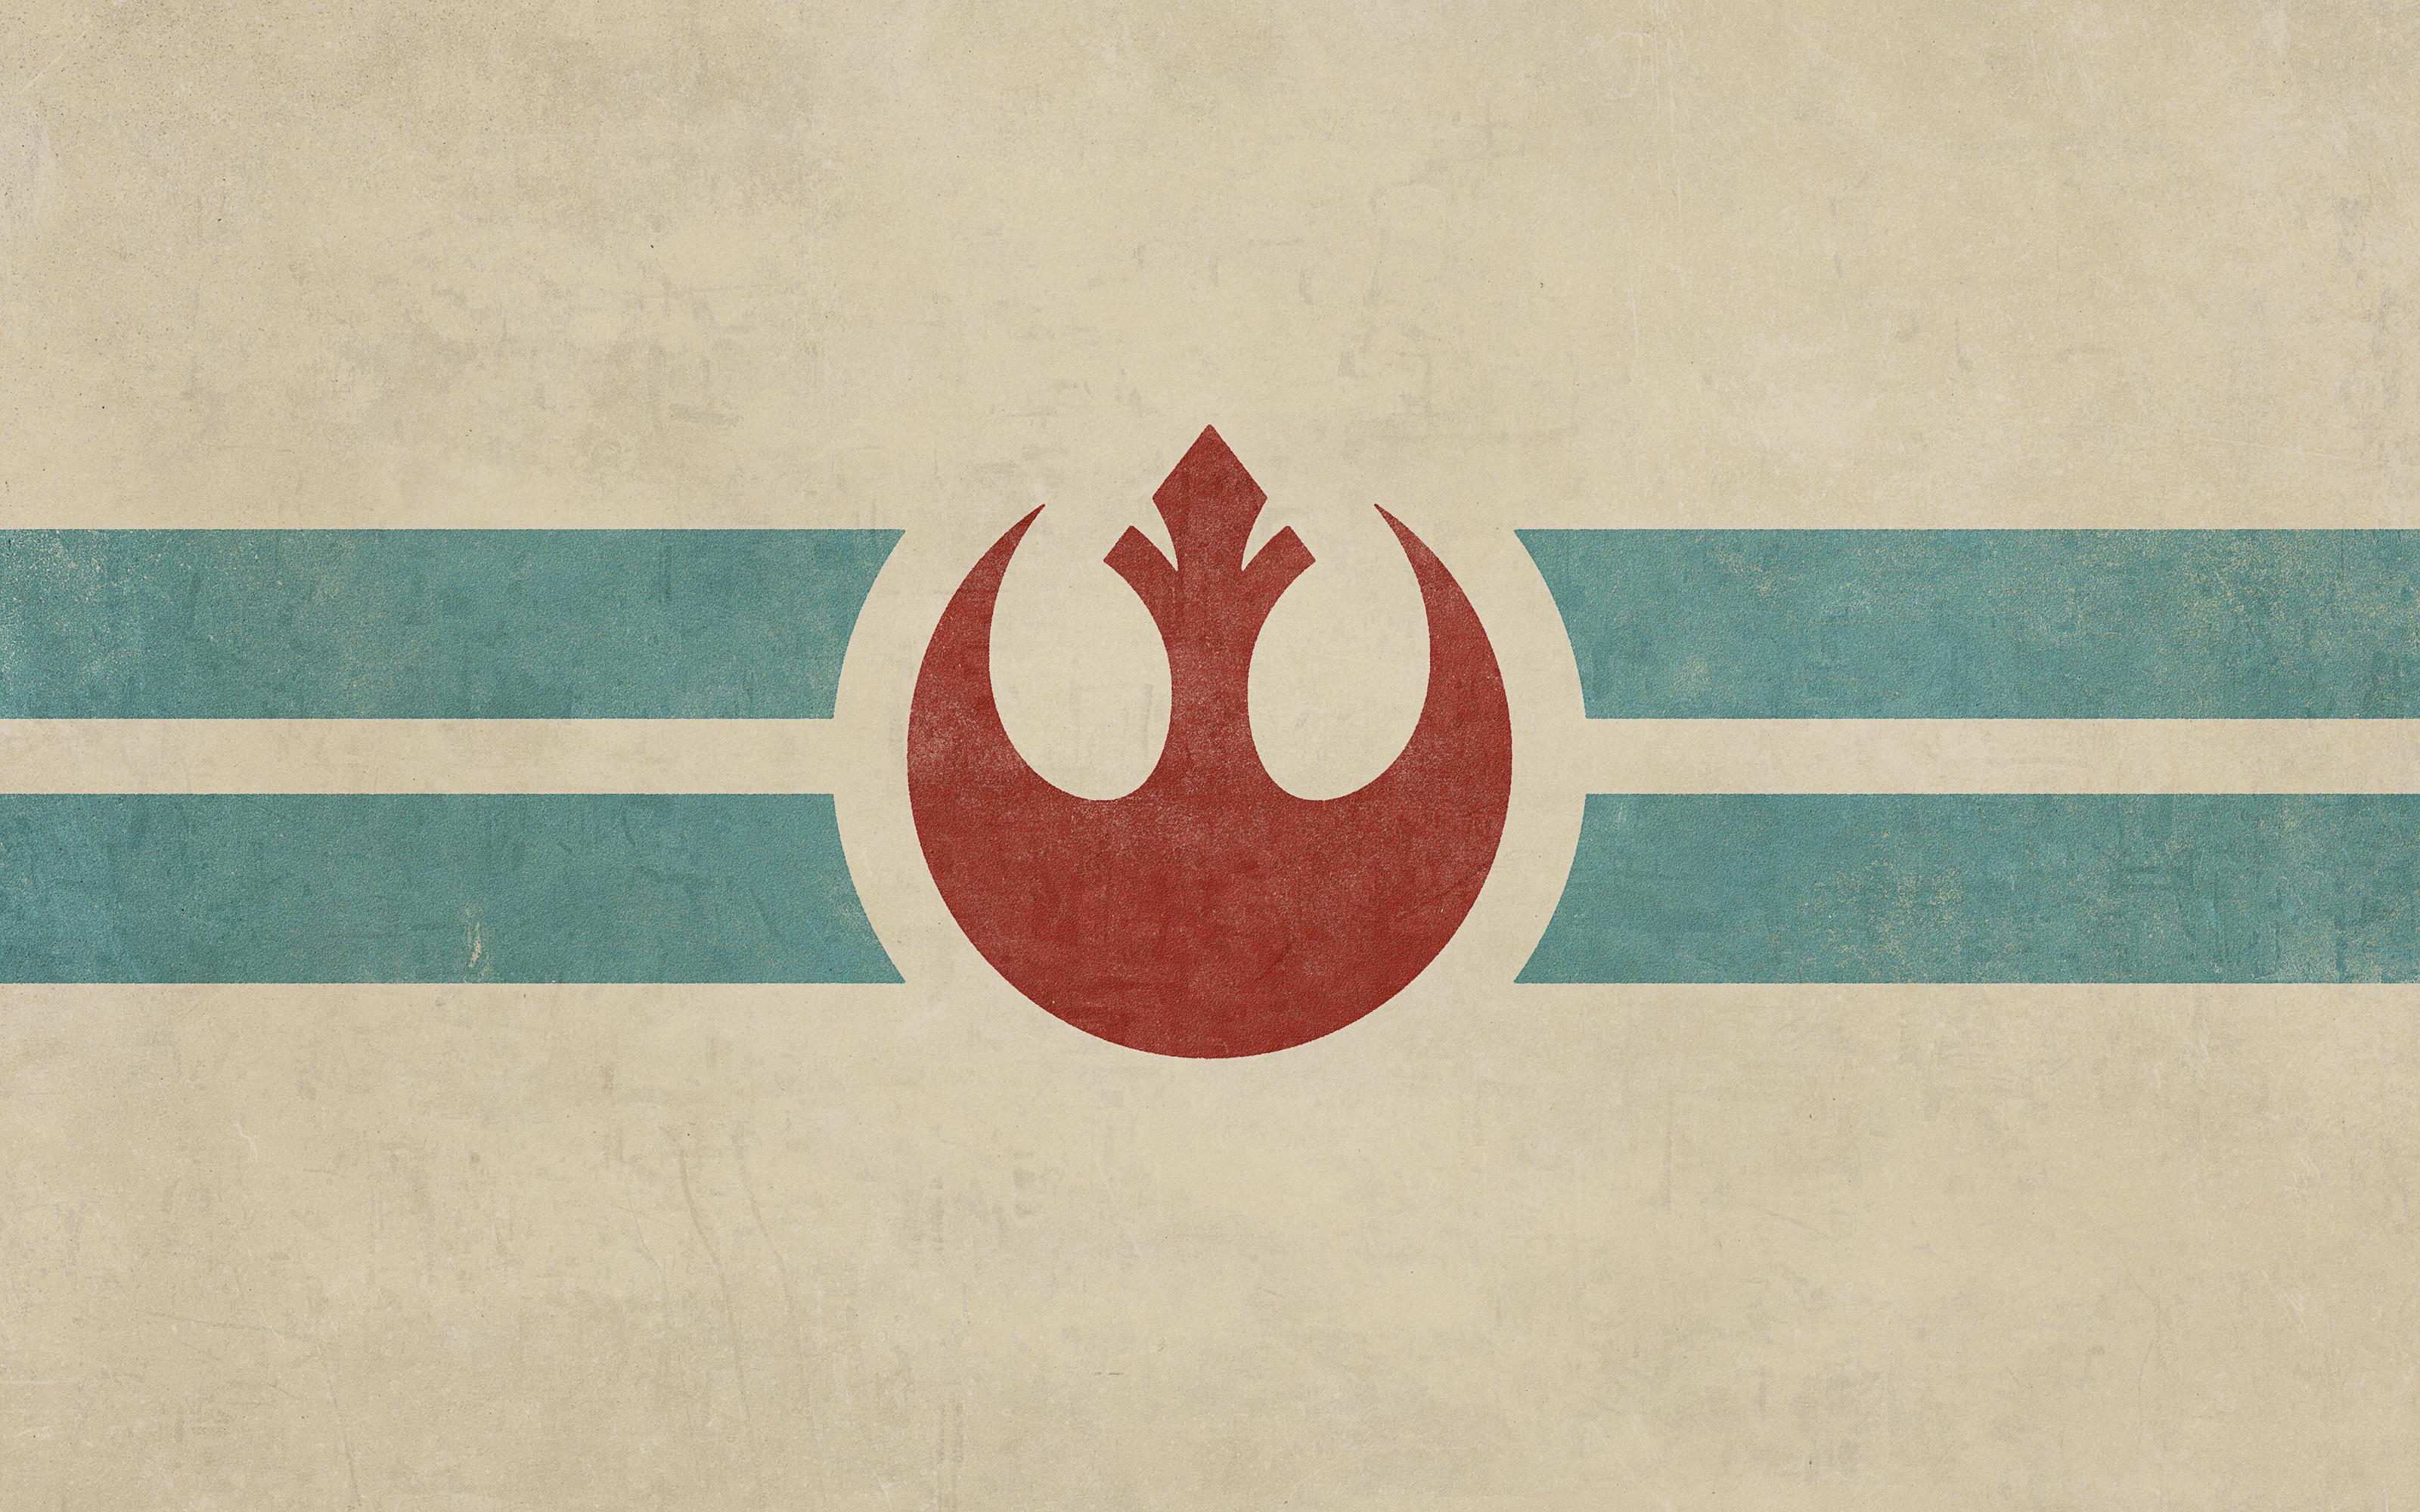 Rebel Alliance Wallpapers Wallpapertag